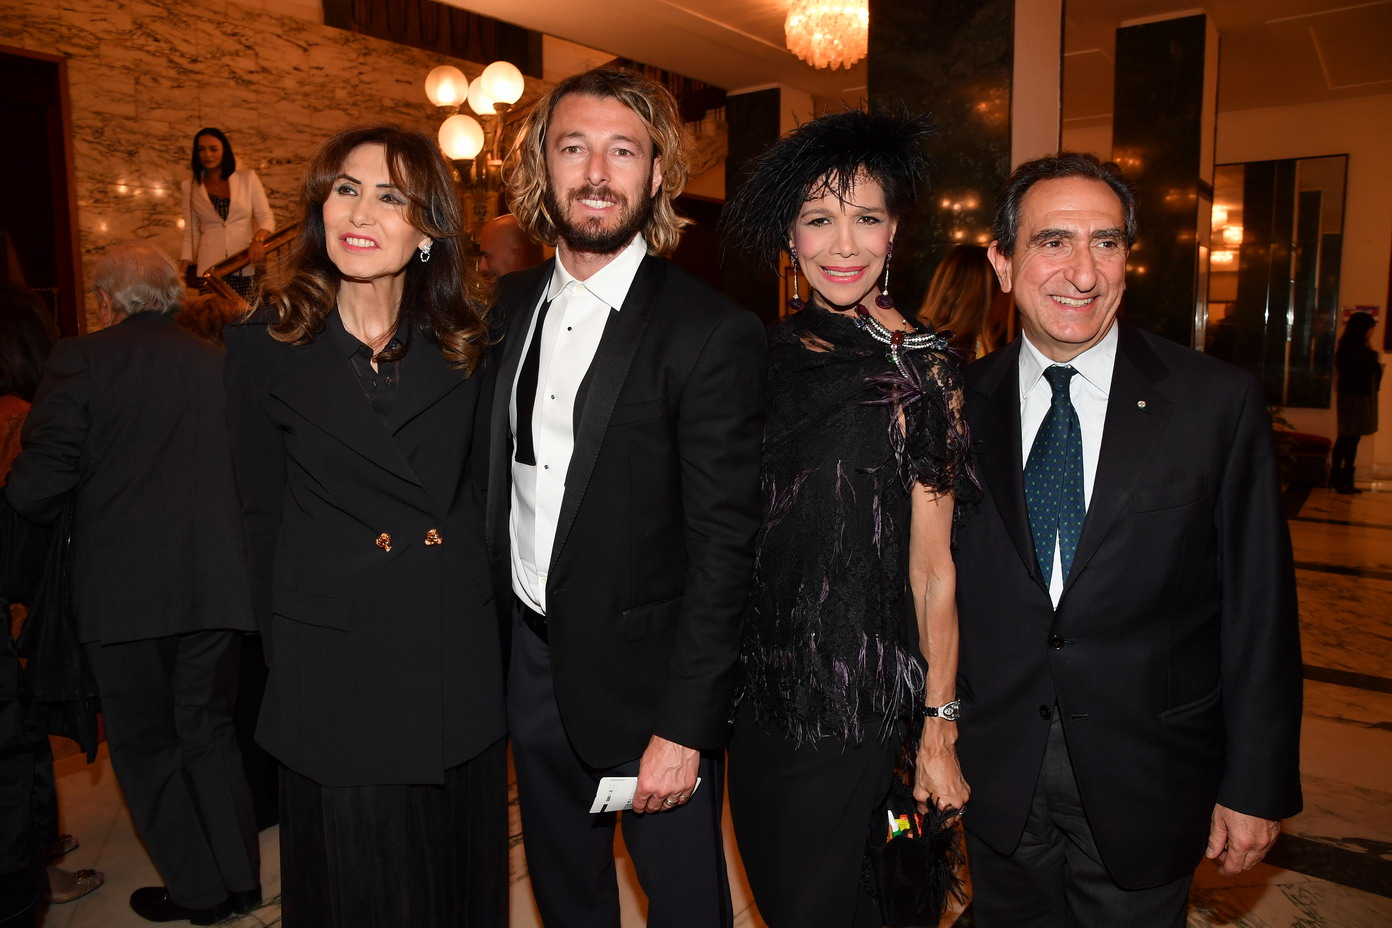 Maria Pia Ruspoli, Federico Balzaretti, Marisela Federici, Carlo Fuertes